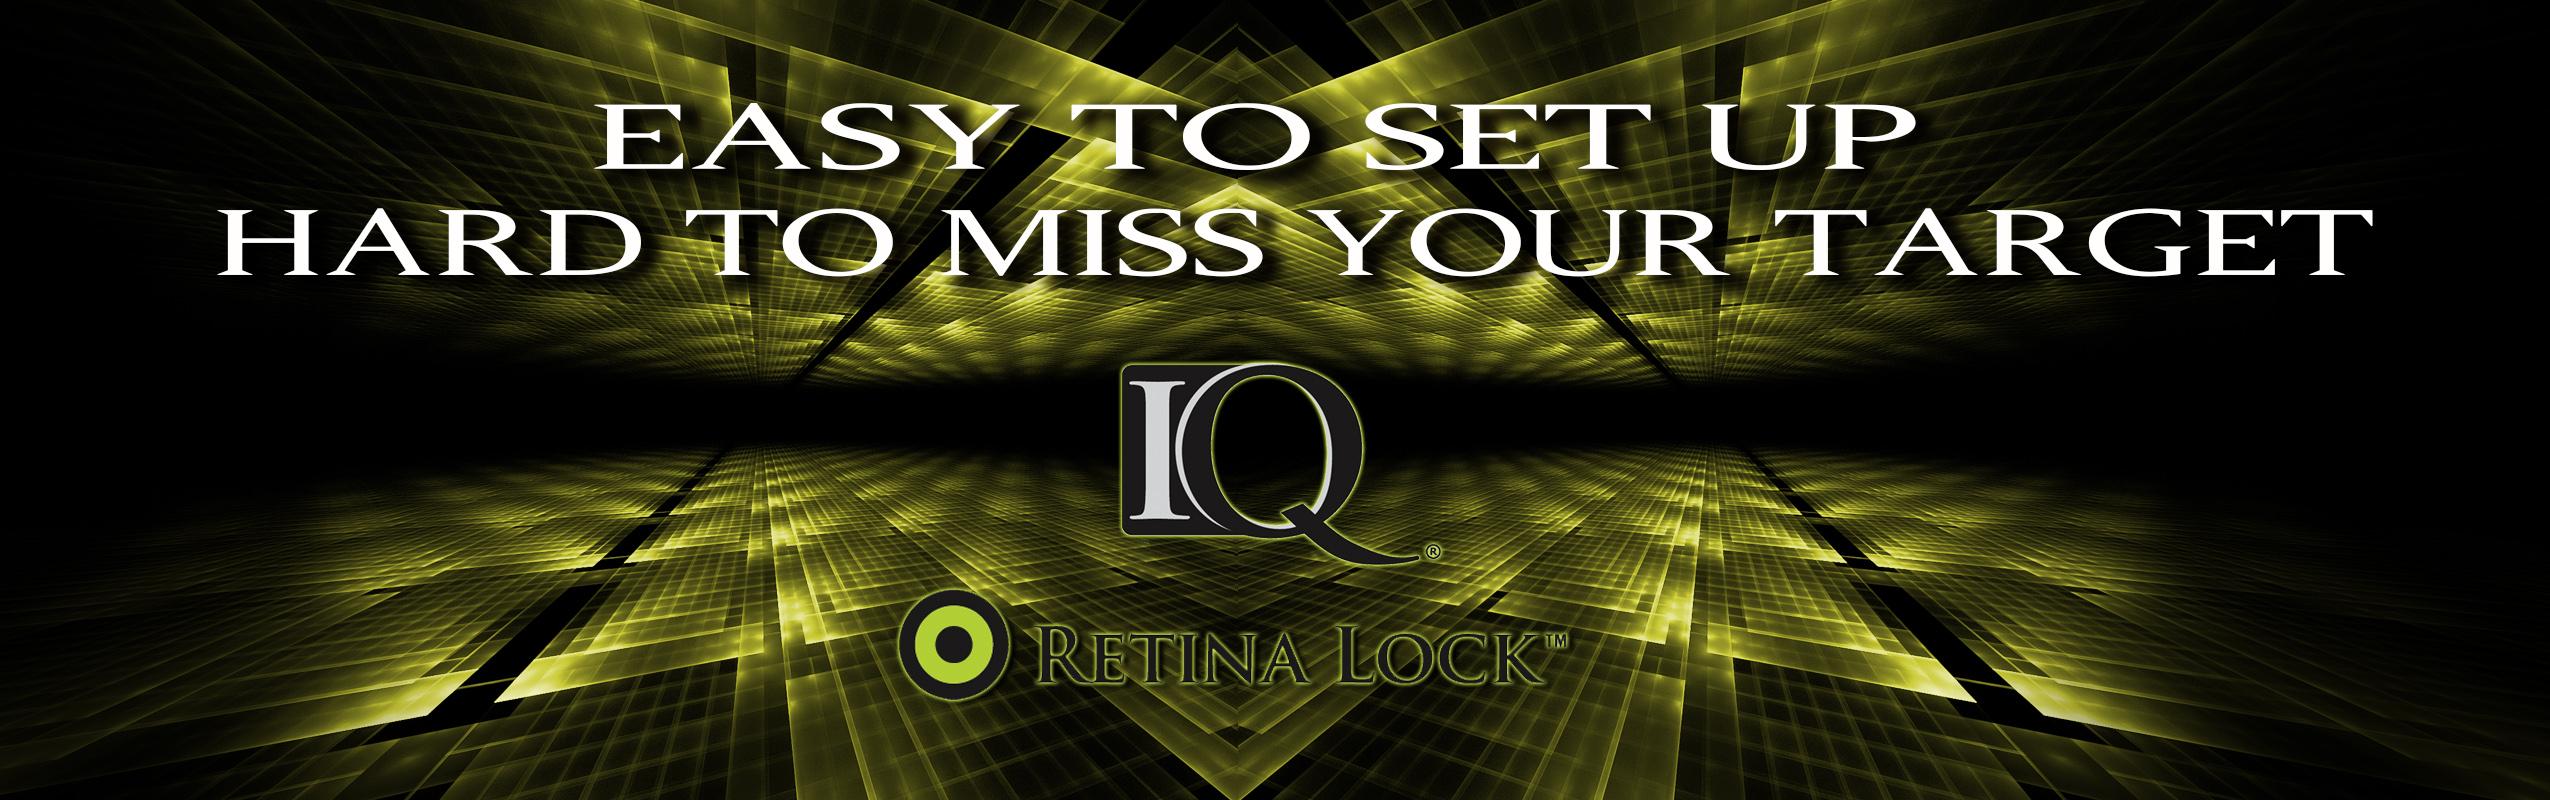 iq-retina-lock-slider-web-.jpg